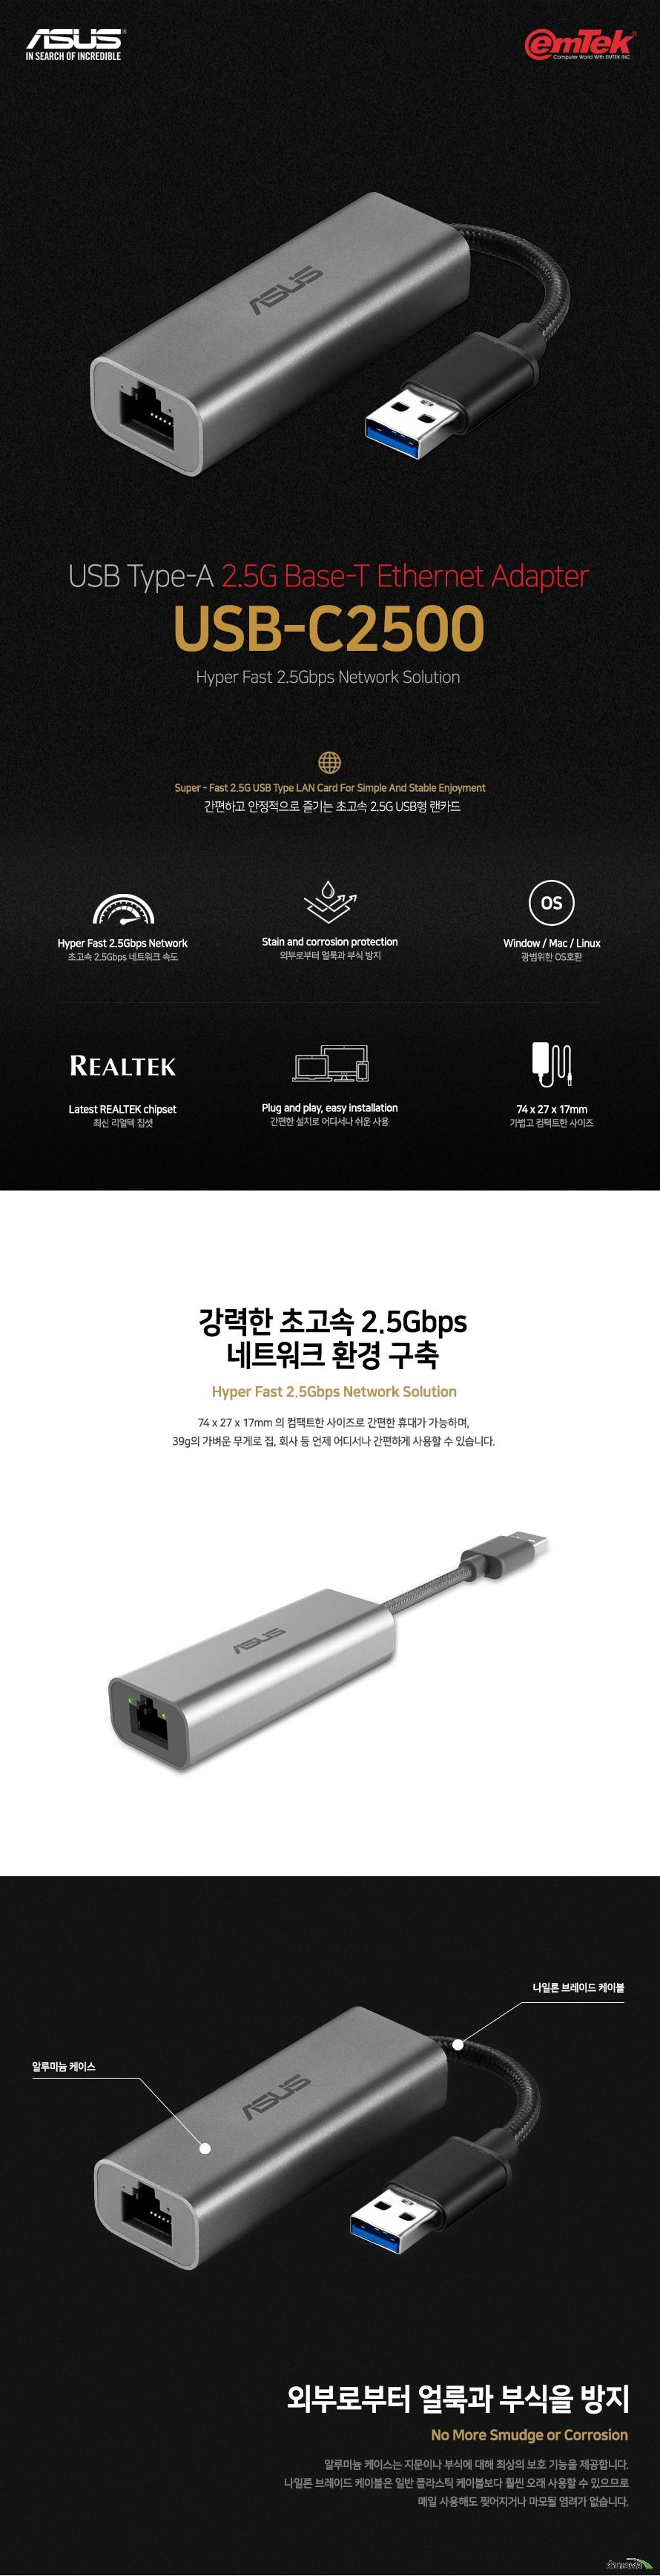 ASUS USB-C2500 랜카드 초고속 2.5Gbps 네트워크 속도 외부로부터 얼룩과 부식 방지 Window / Mac / Linux 광범위한 OS호환 최신 리얼텍 칩셋 간편한 설치로 어디서나 쉬운 사용 74 x 27 x 17mm 가볍고 컴팩트한 사이즈  모델명 USB-C2500  포트 속성 입력 USB 3.2 Gen1 Type-A 출력 100 / 1000 / 2500Mbps RJ45 포트   LED 표시기 이중 색상 링크 / 속도 LED 이중 색상 전원 / 활동 LED  검색 전용 ProductType-NIC  구성 USB-C2500 이더넷 어댑터, 빠른 시작 안내서, 보증 카드  사이즈 74 x 27 x 17 mm  무게  39g  KC 인증 R-R-MSQ-USB-C2500